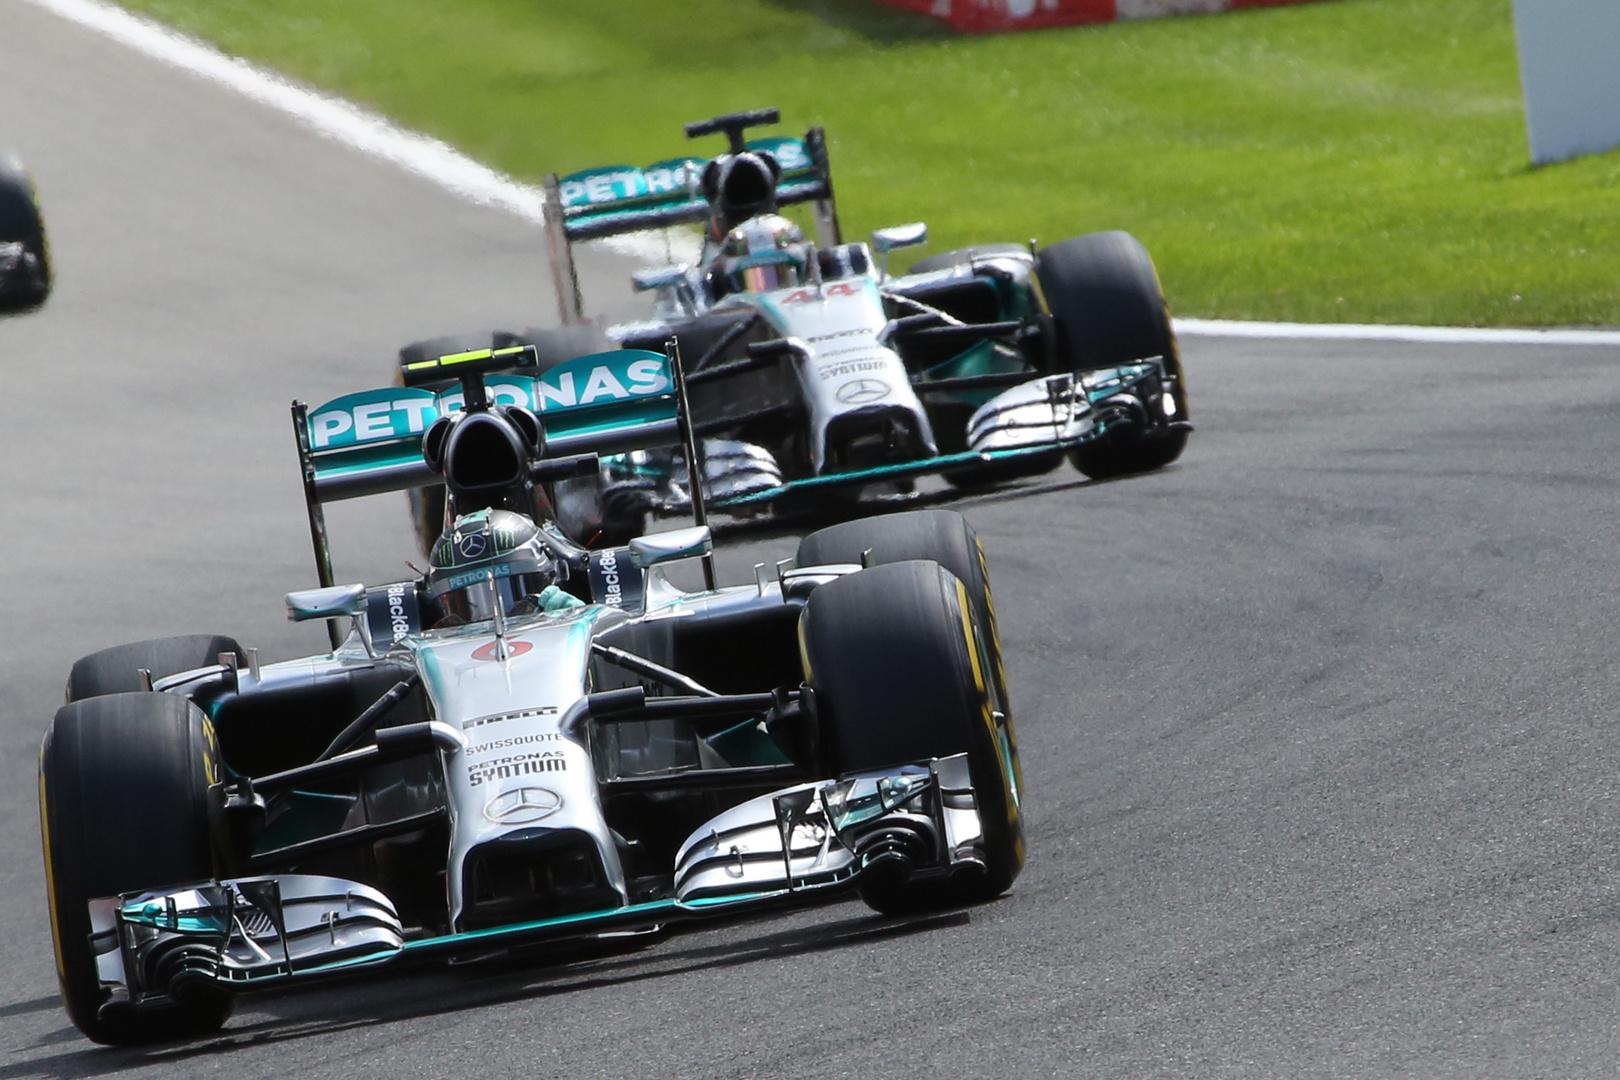 Nico Rosberg-Lewis Hamilton Krieg der Sterne